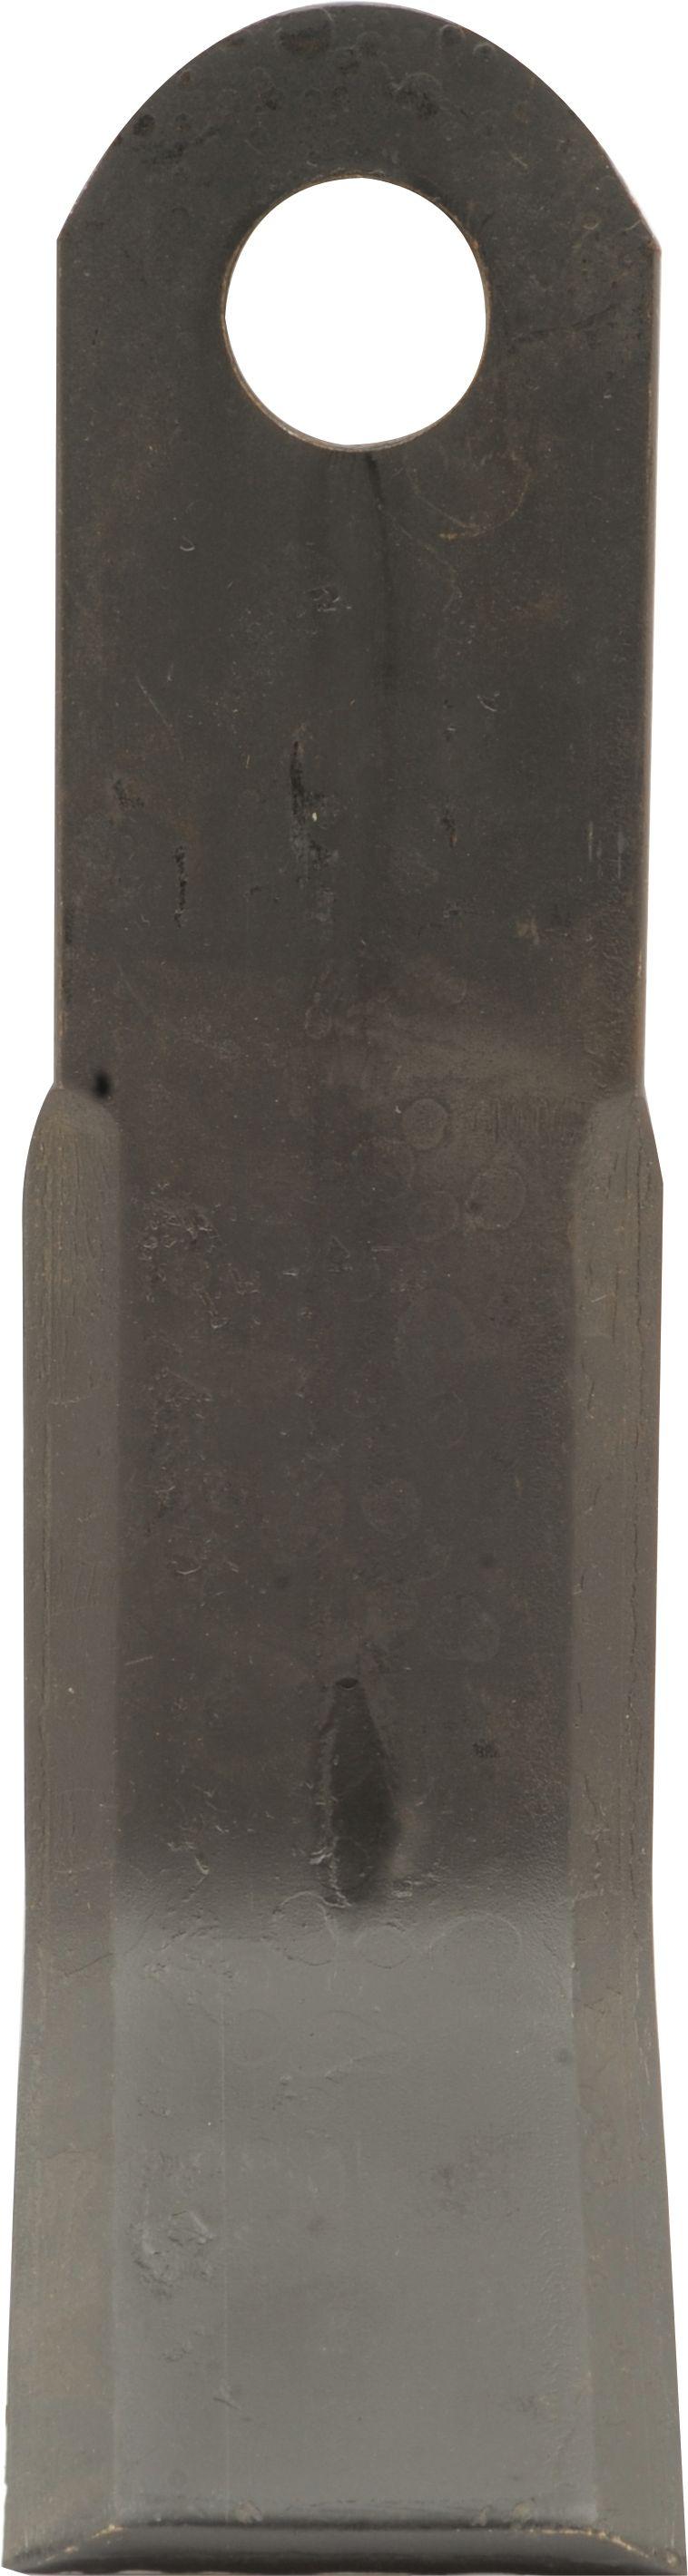 LAGARDE FLAIL-LAGERDE 60X8 H245 D25.5